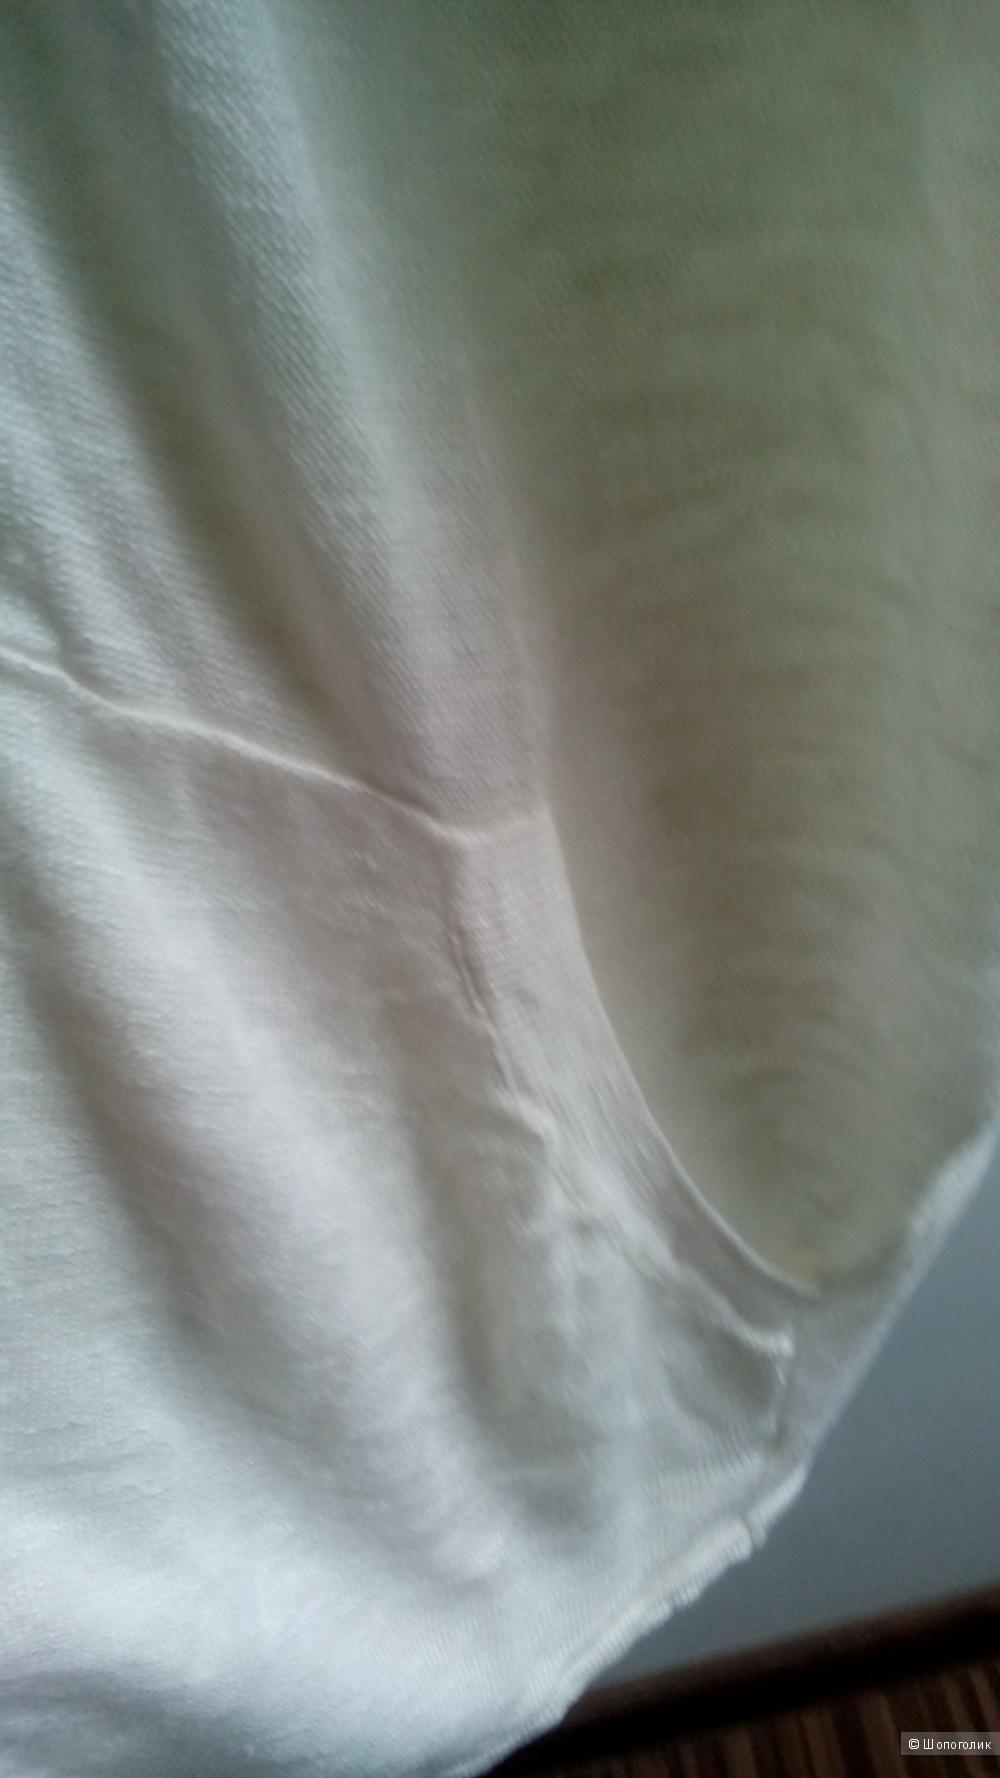 Кардиган трикотажный теплого белого цвета(лен-вискоза) BARBARA ALVISI  Италия (44-46-48)